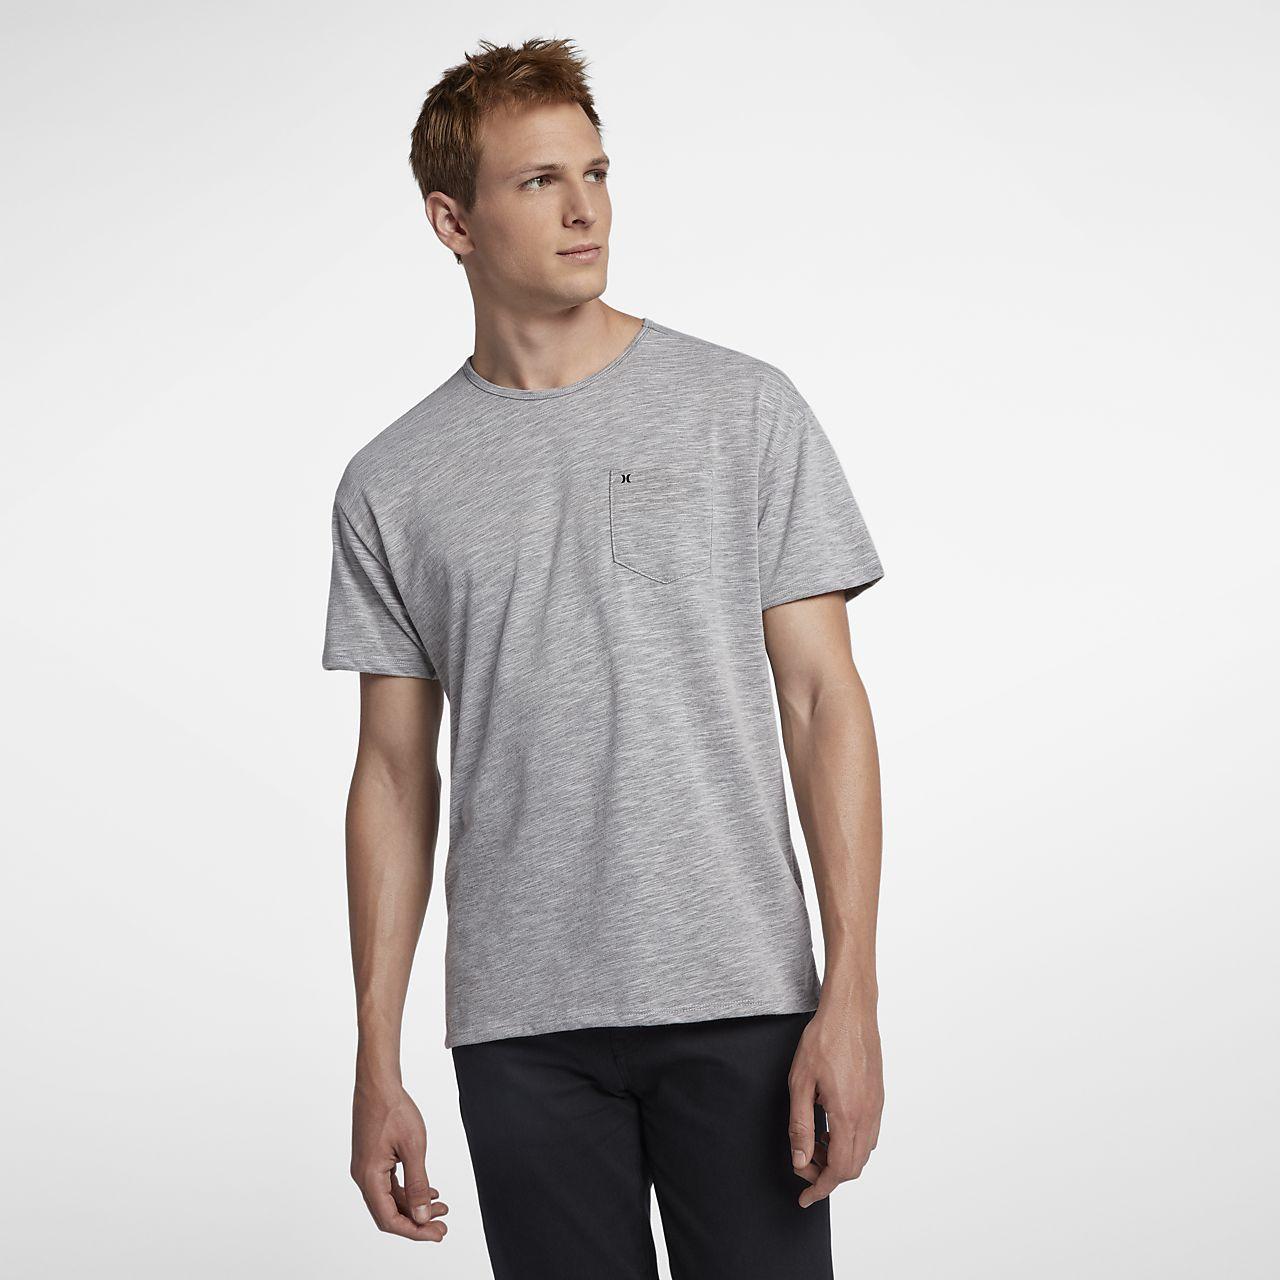 ... Hurley Dri-FIT Lagos Port Men's T-shirt